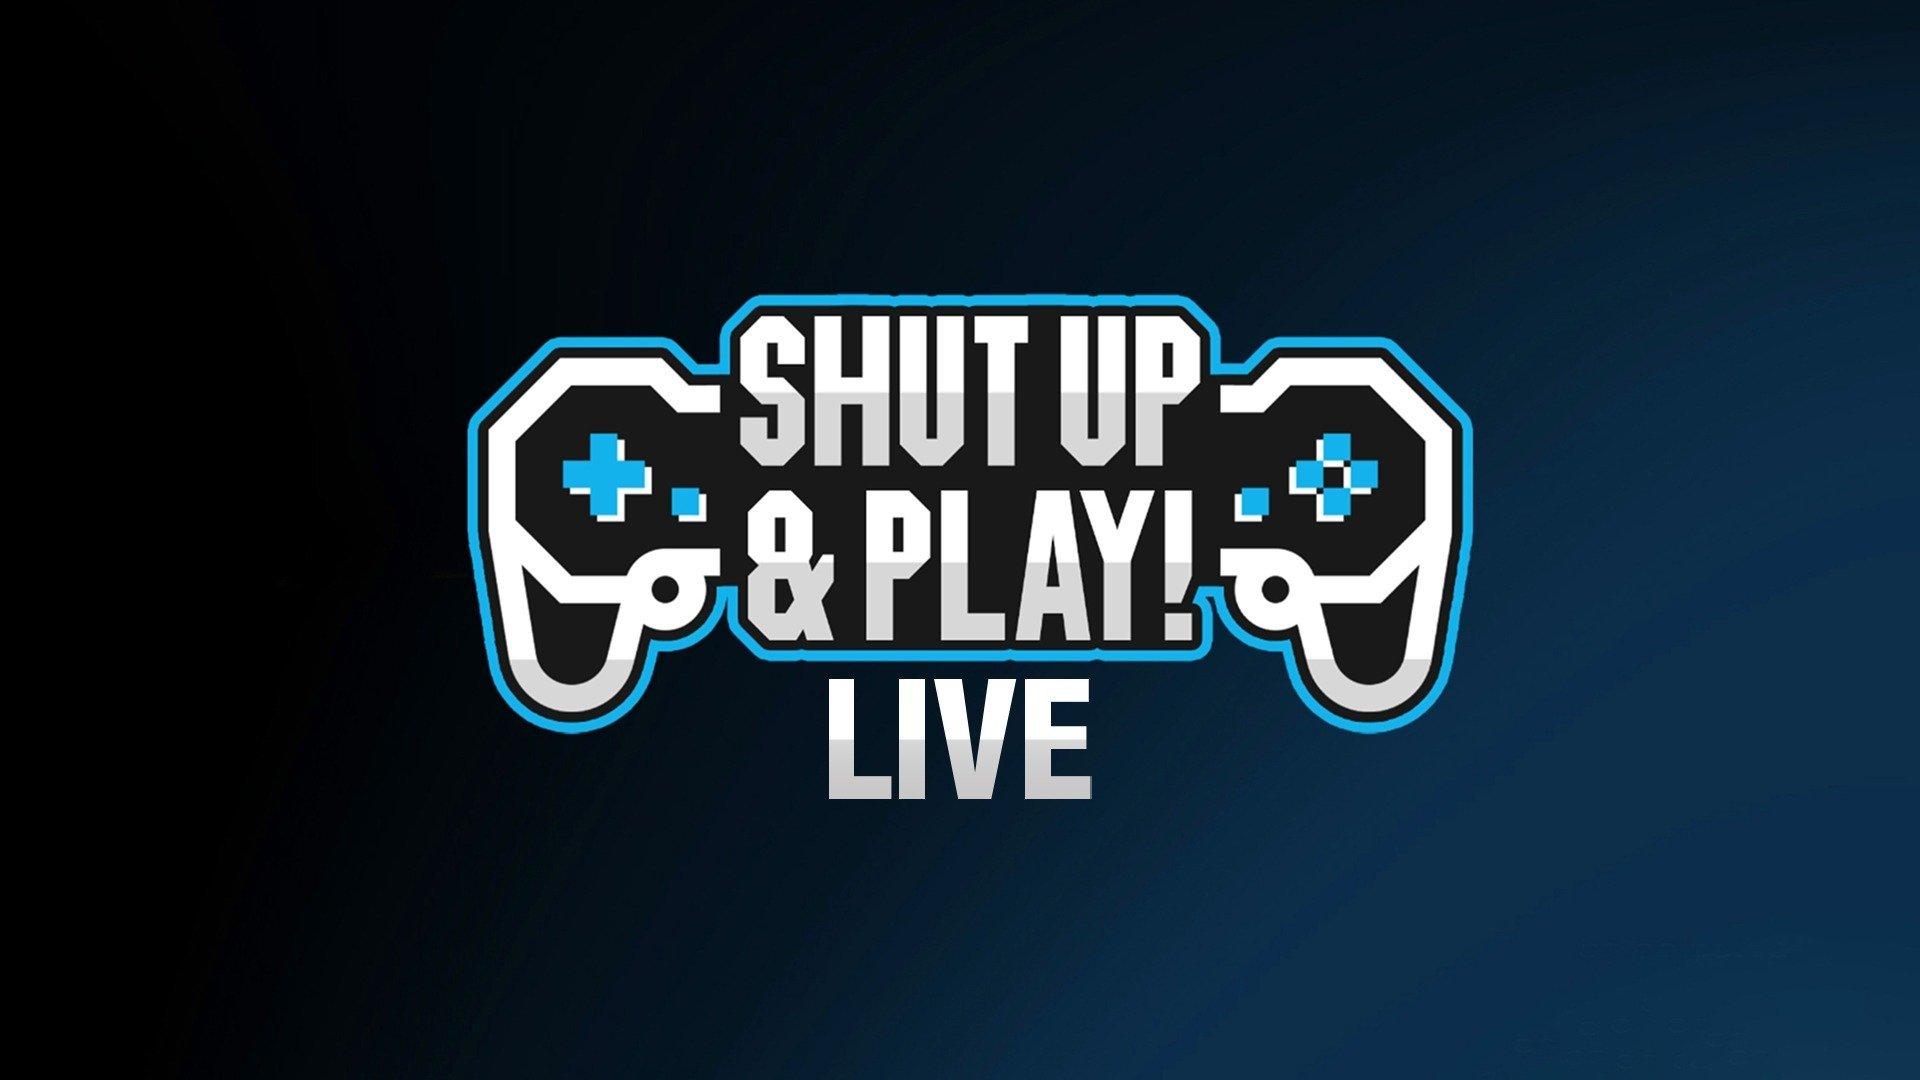 Shut Up & Play Live